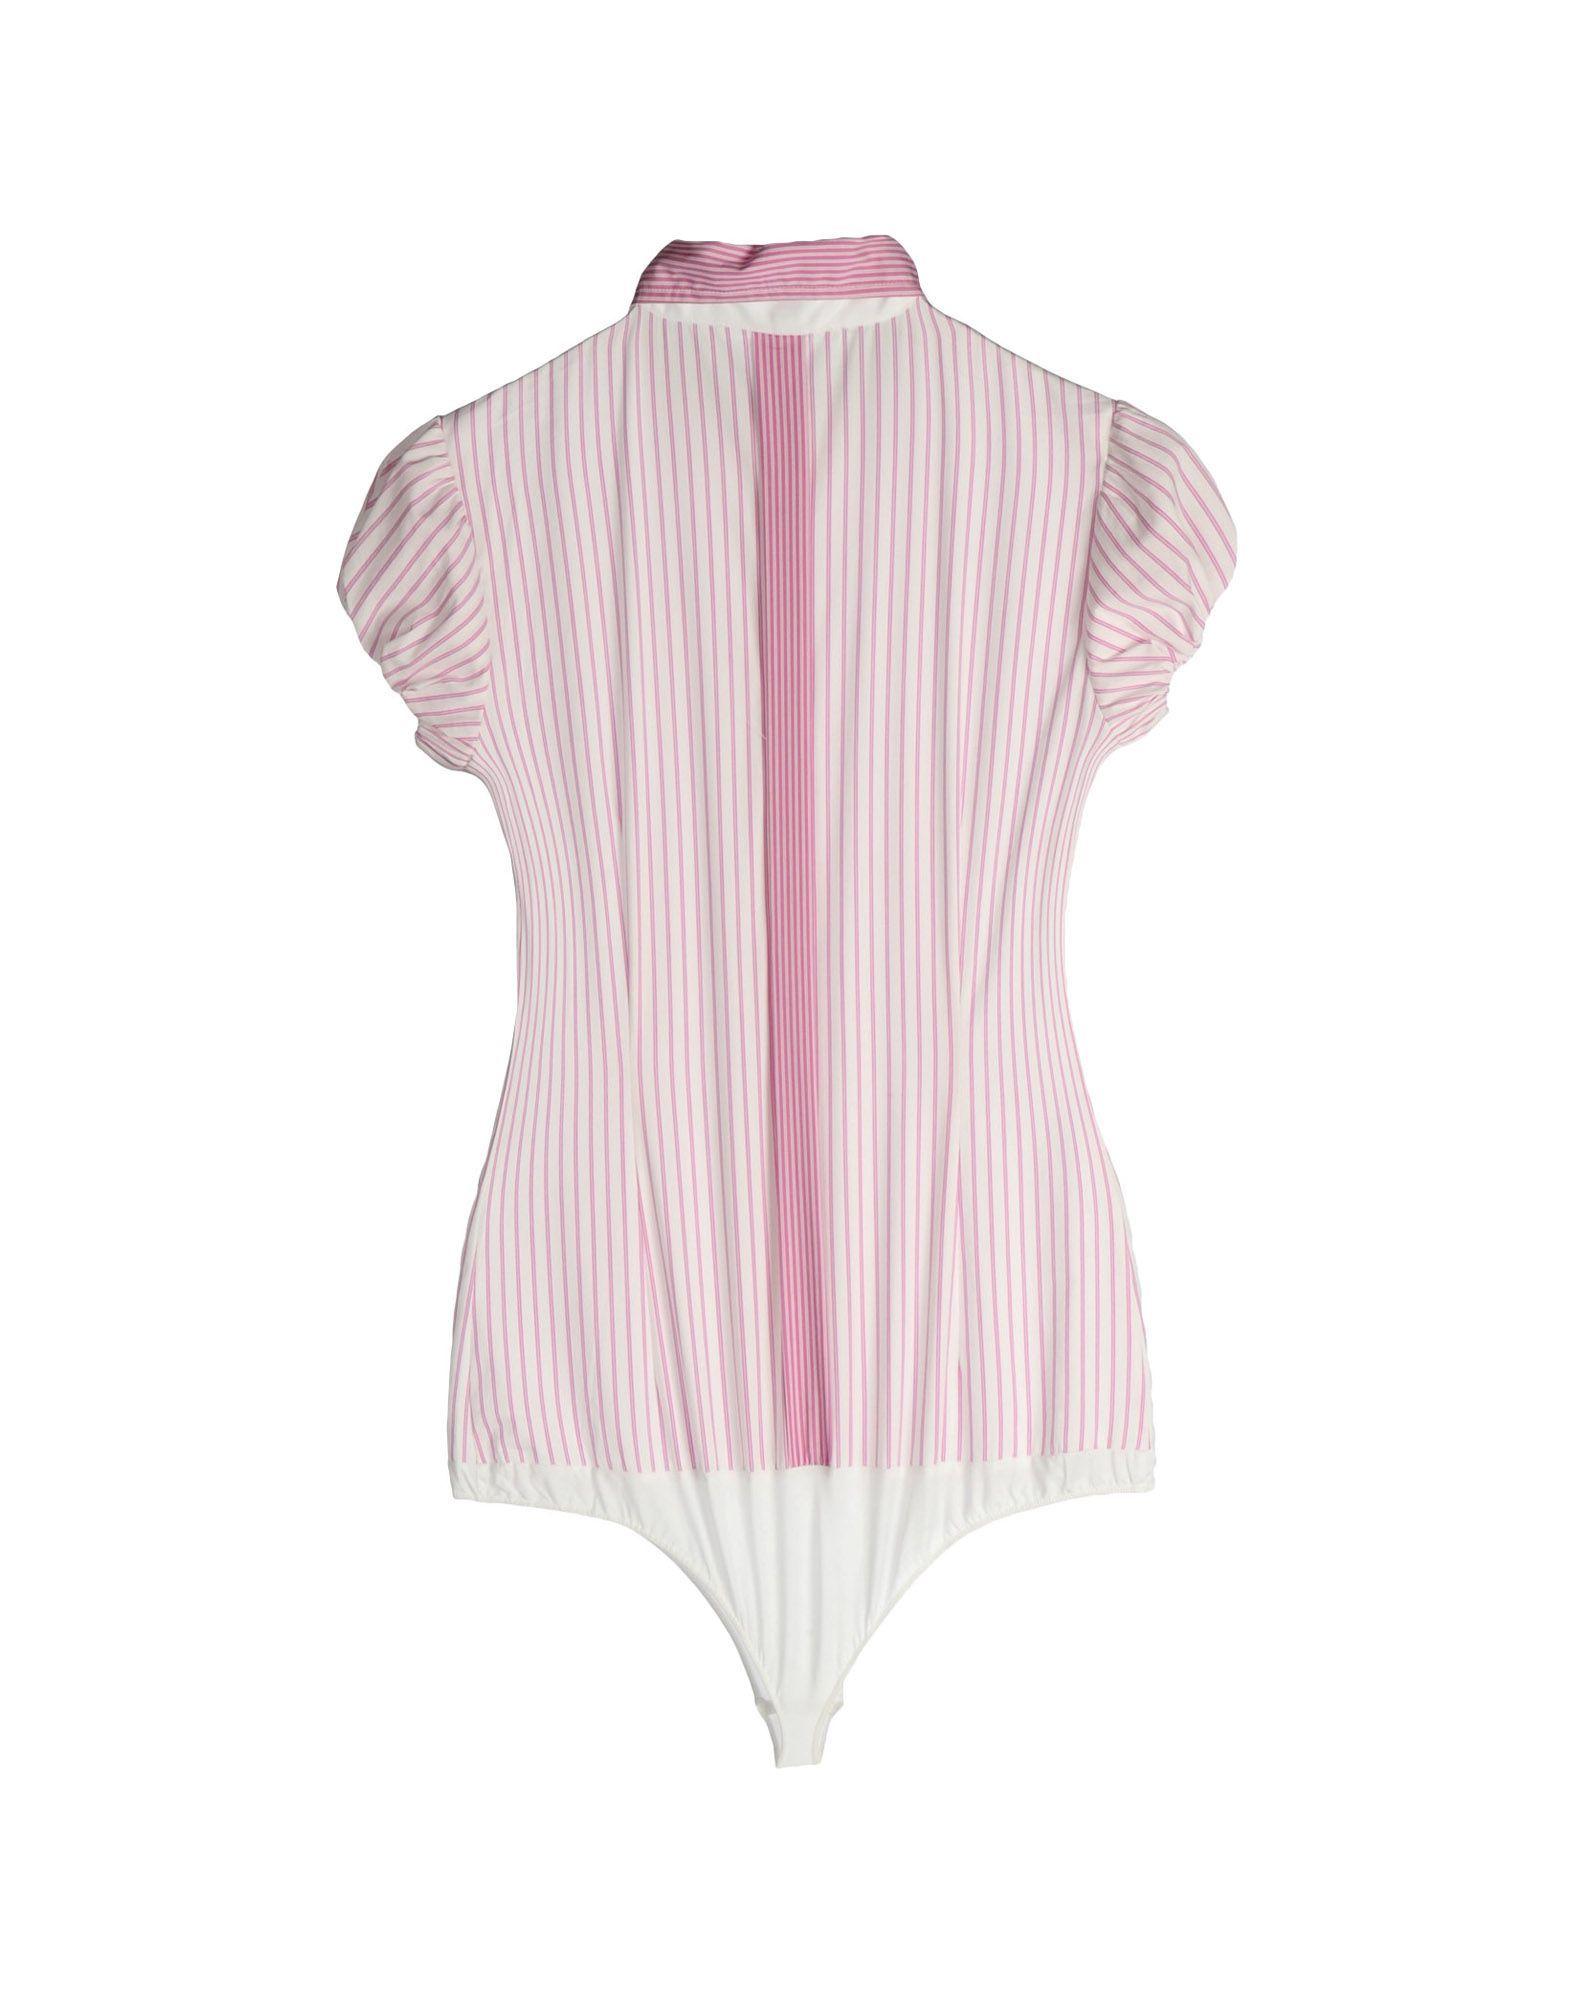 Nenette Light Purple Cotton Stripe Shirt Bodysuit